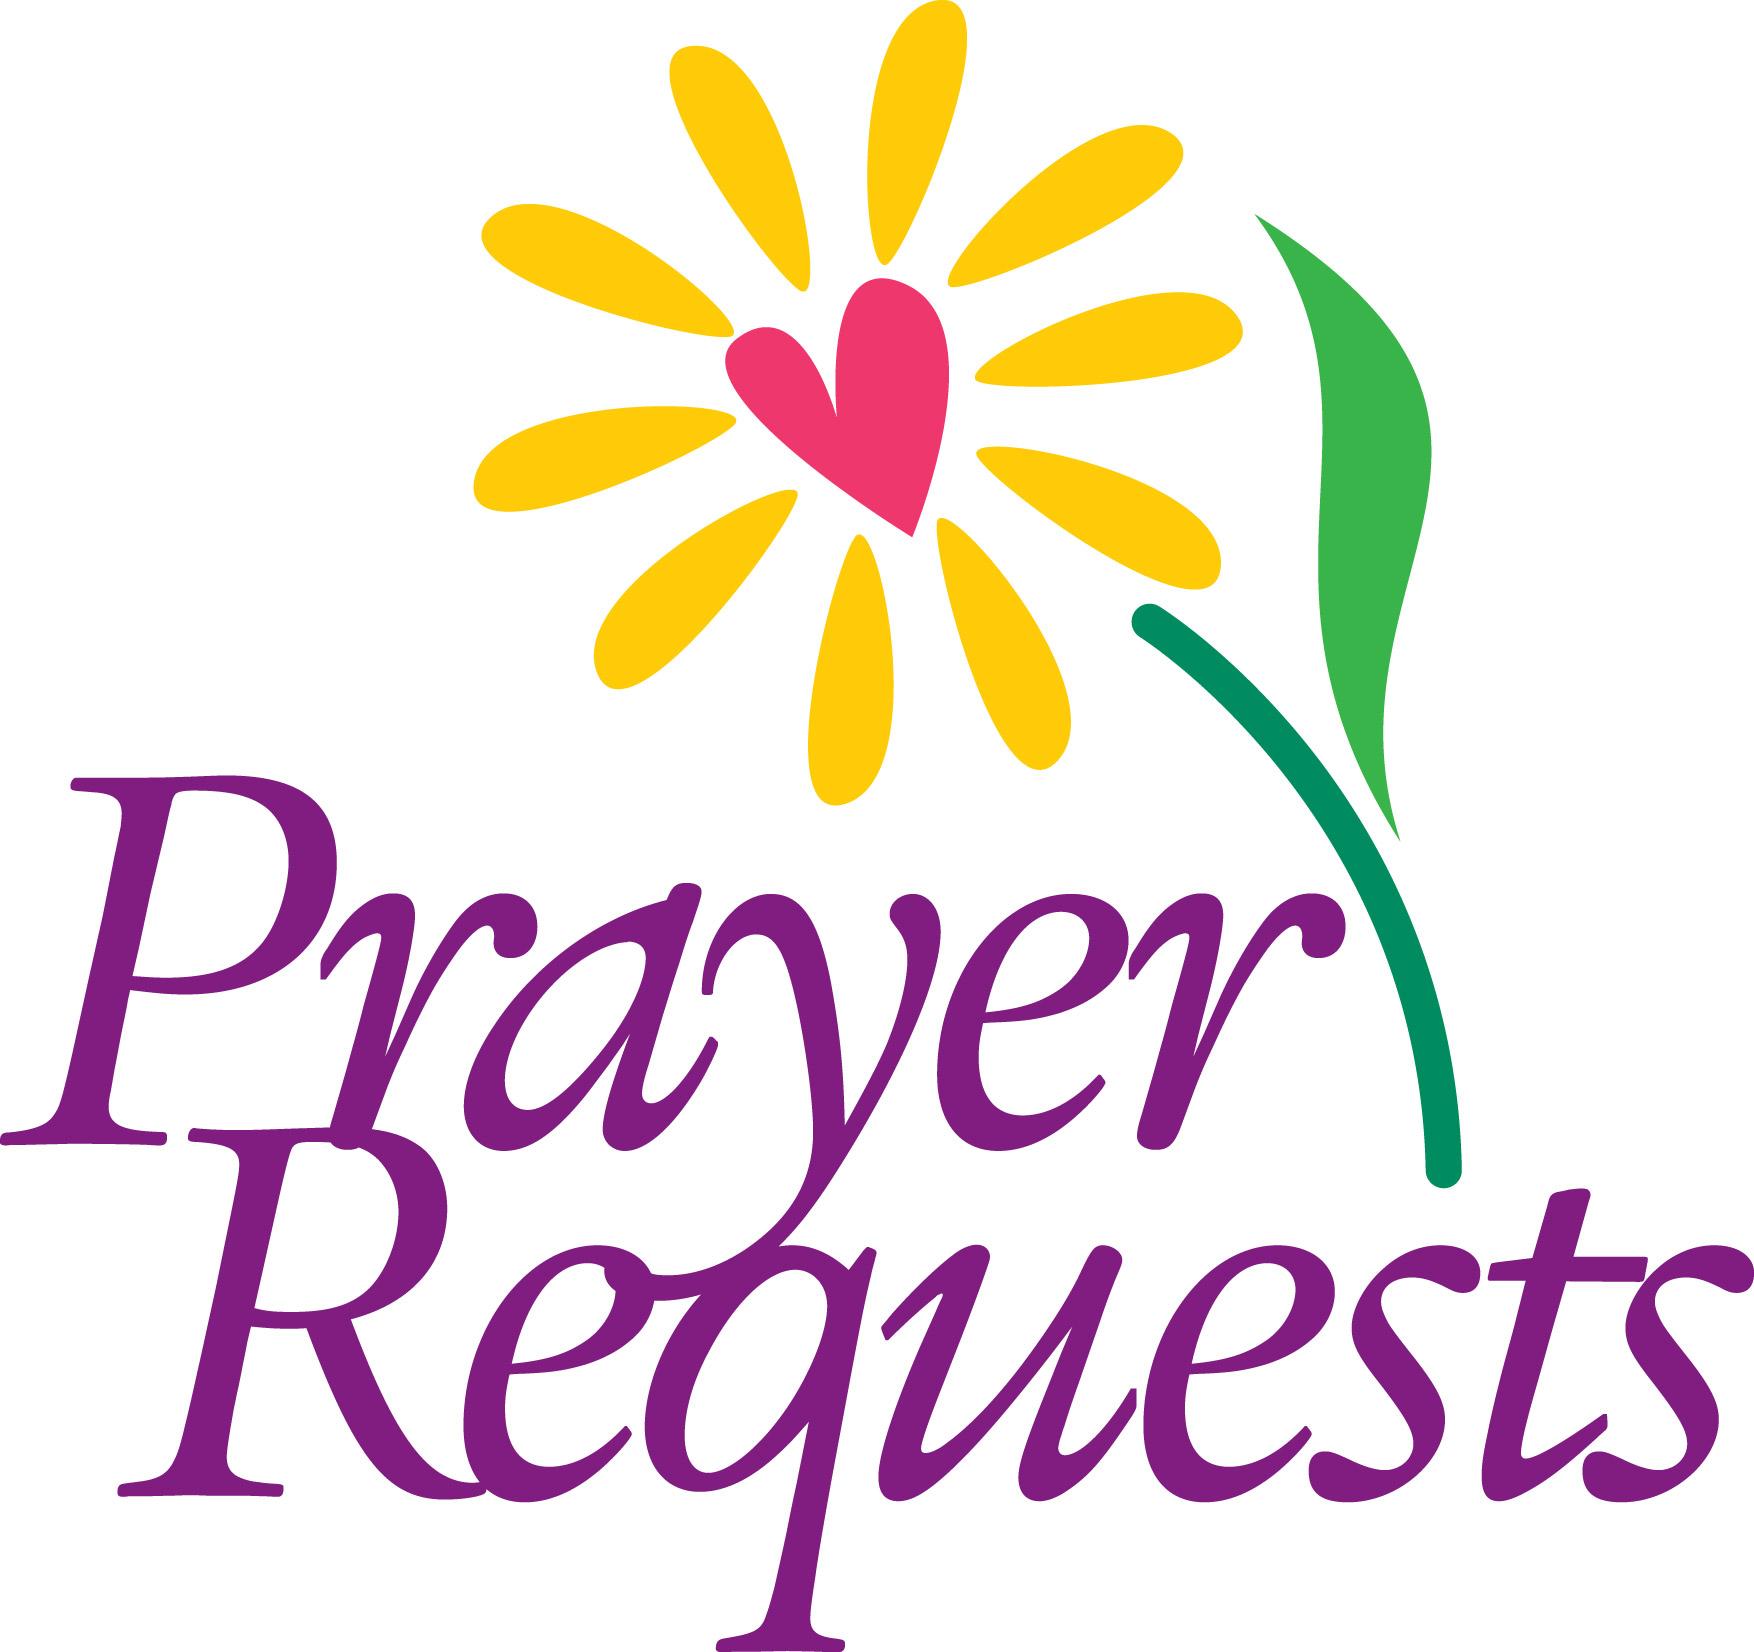 Free Prayer Request Clip Art free image.